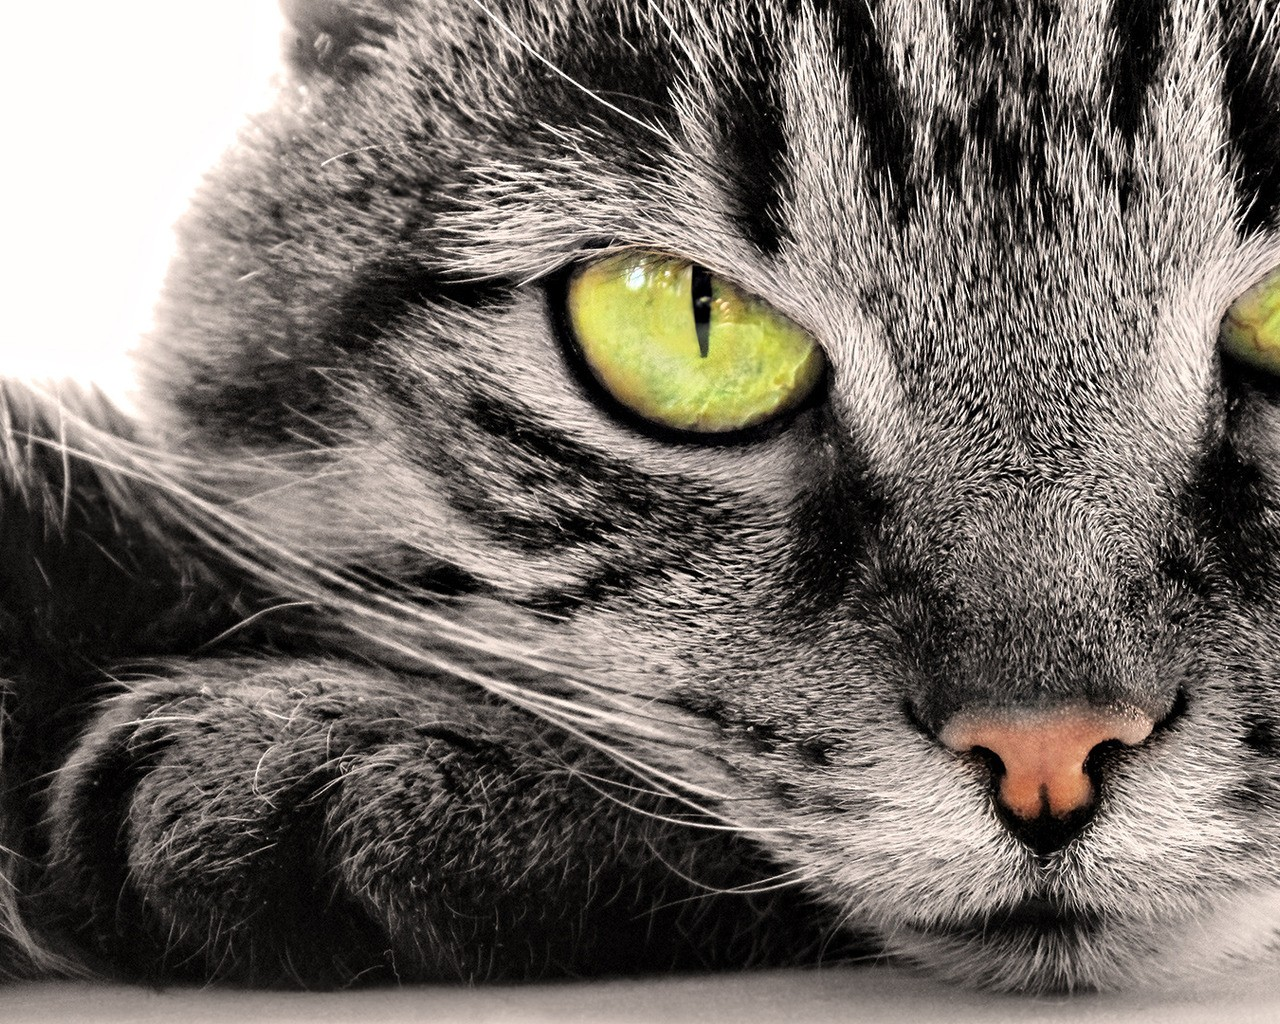 https://1.bp.blogspot.com/-c-tepJMHeBM/TlRNQ9DI1TI/AAAAAAAAAMk/dGa6Lhbaxm0/s1600/wallpaper-921744_cats-funny-sweets.jpg